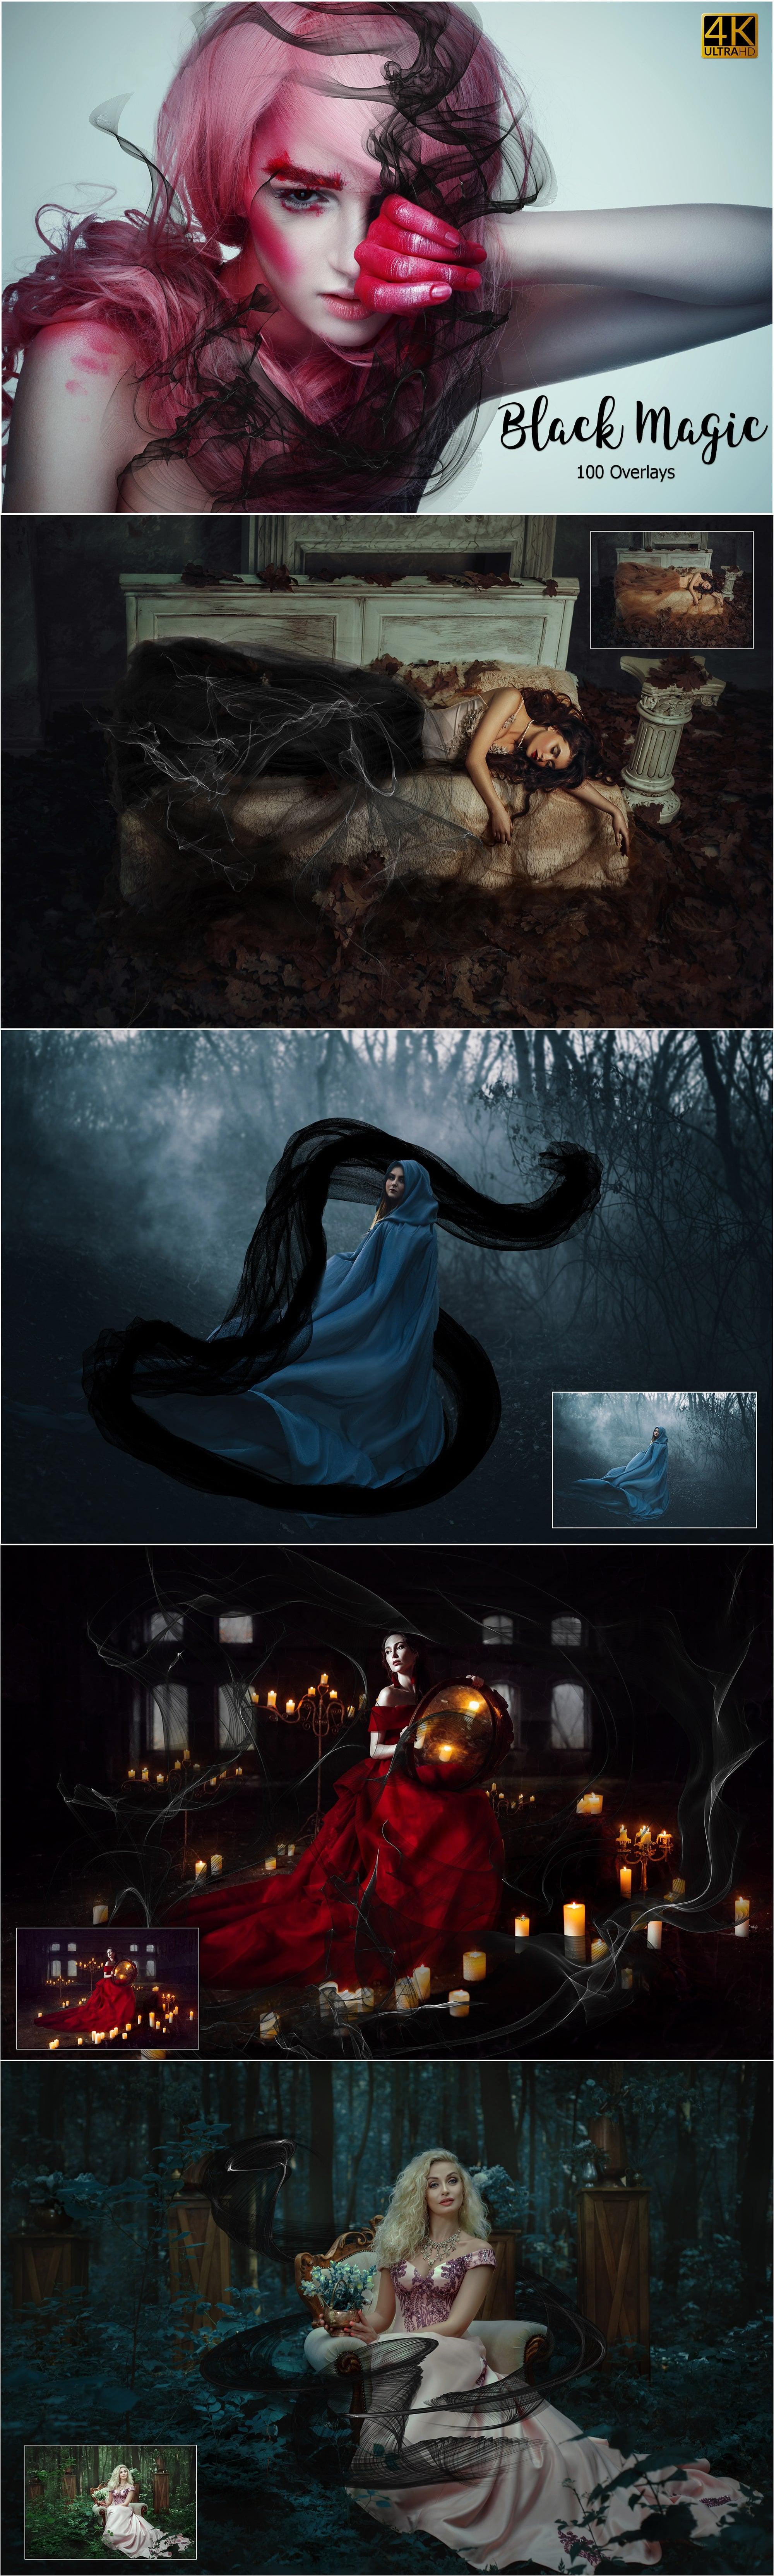 4491 Halloween Photo Effects in 2020. MEGA Halloween Photo Bundle - $ 15 ONLY - 04 Black Magic Overlays min